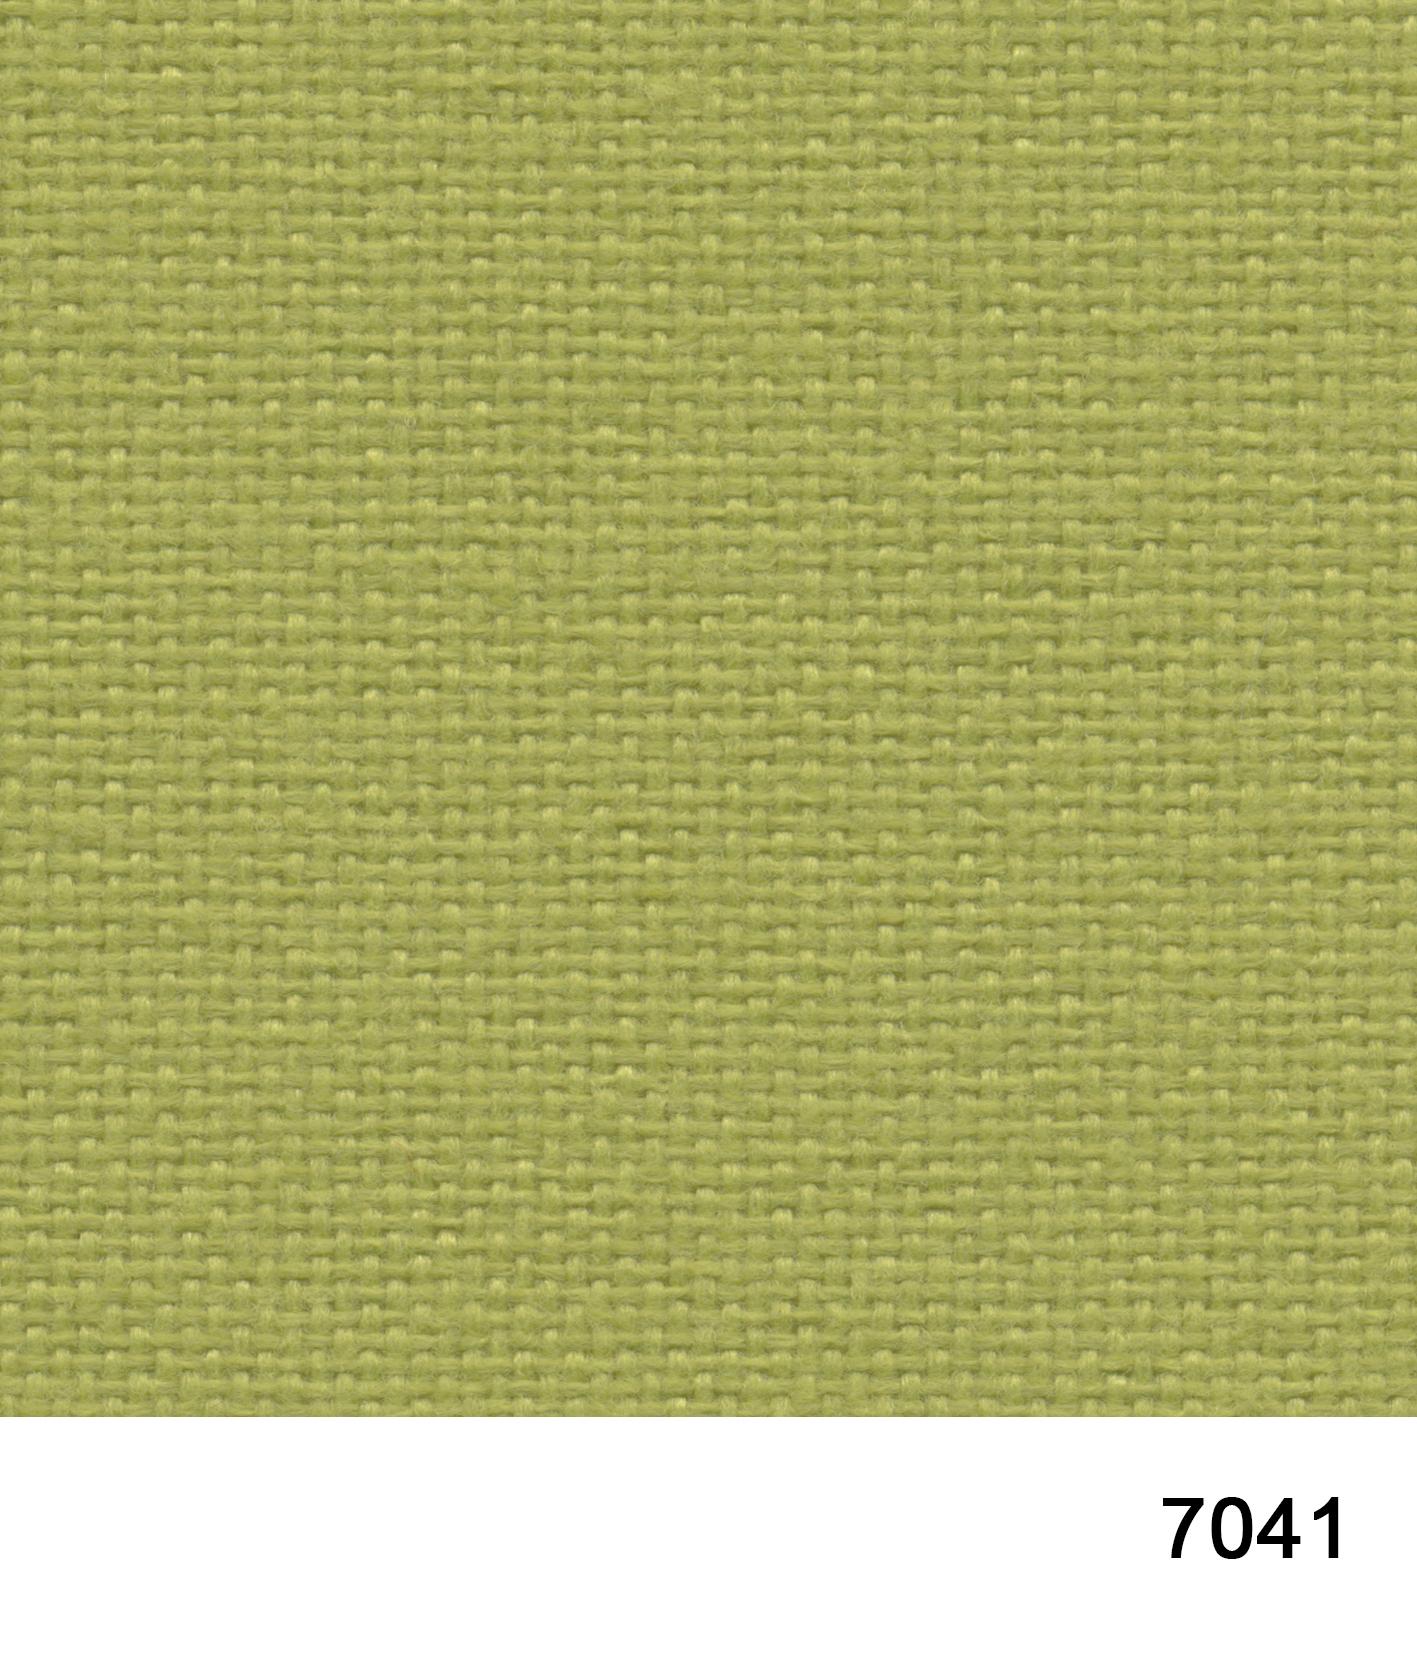 JET BIOACTIVE 3156